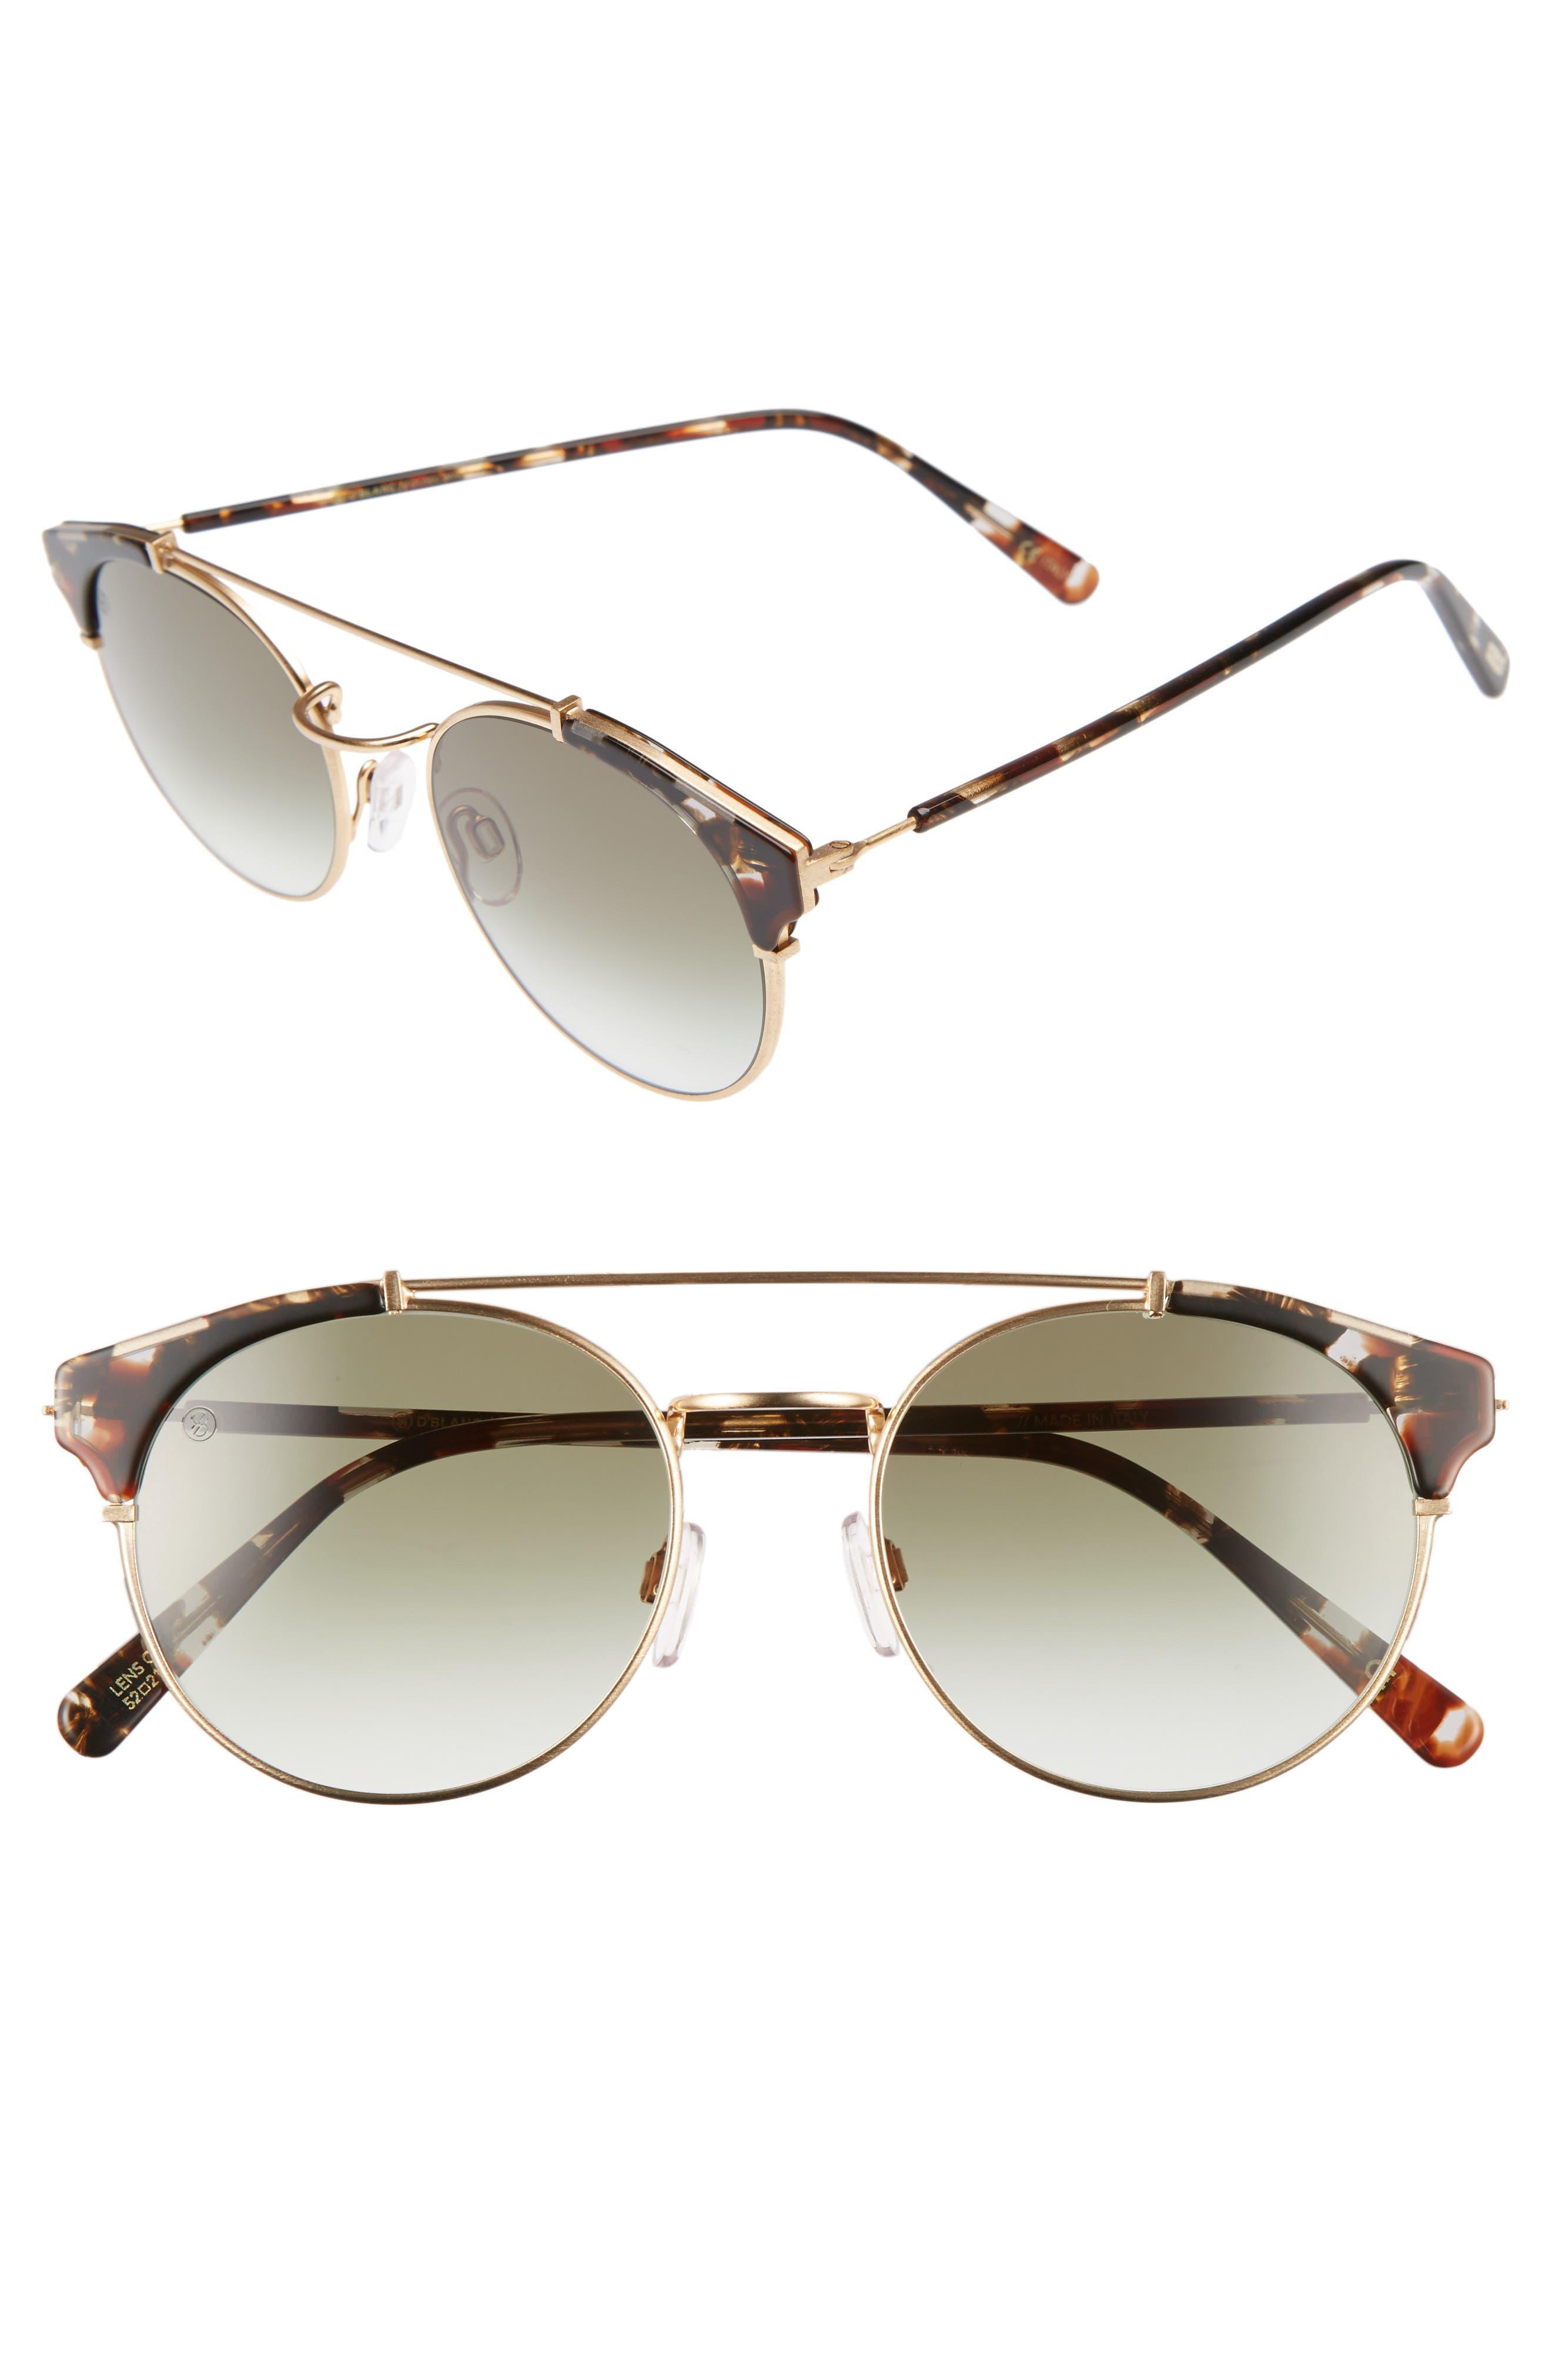 Main Image - D'BLANC x Amuse Society Dosed Marquis 52mm Gradient Round Aviator Sunglasses